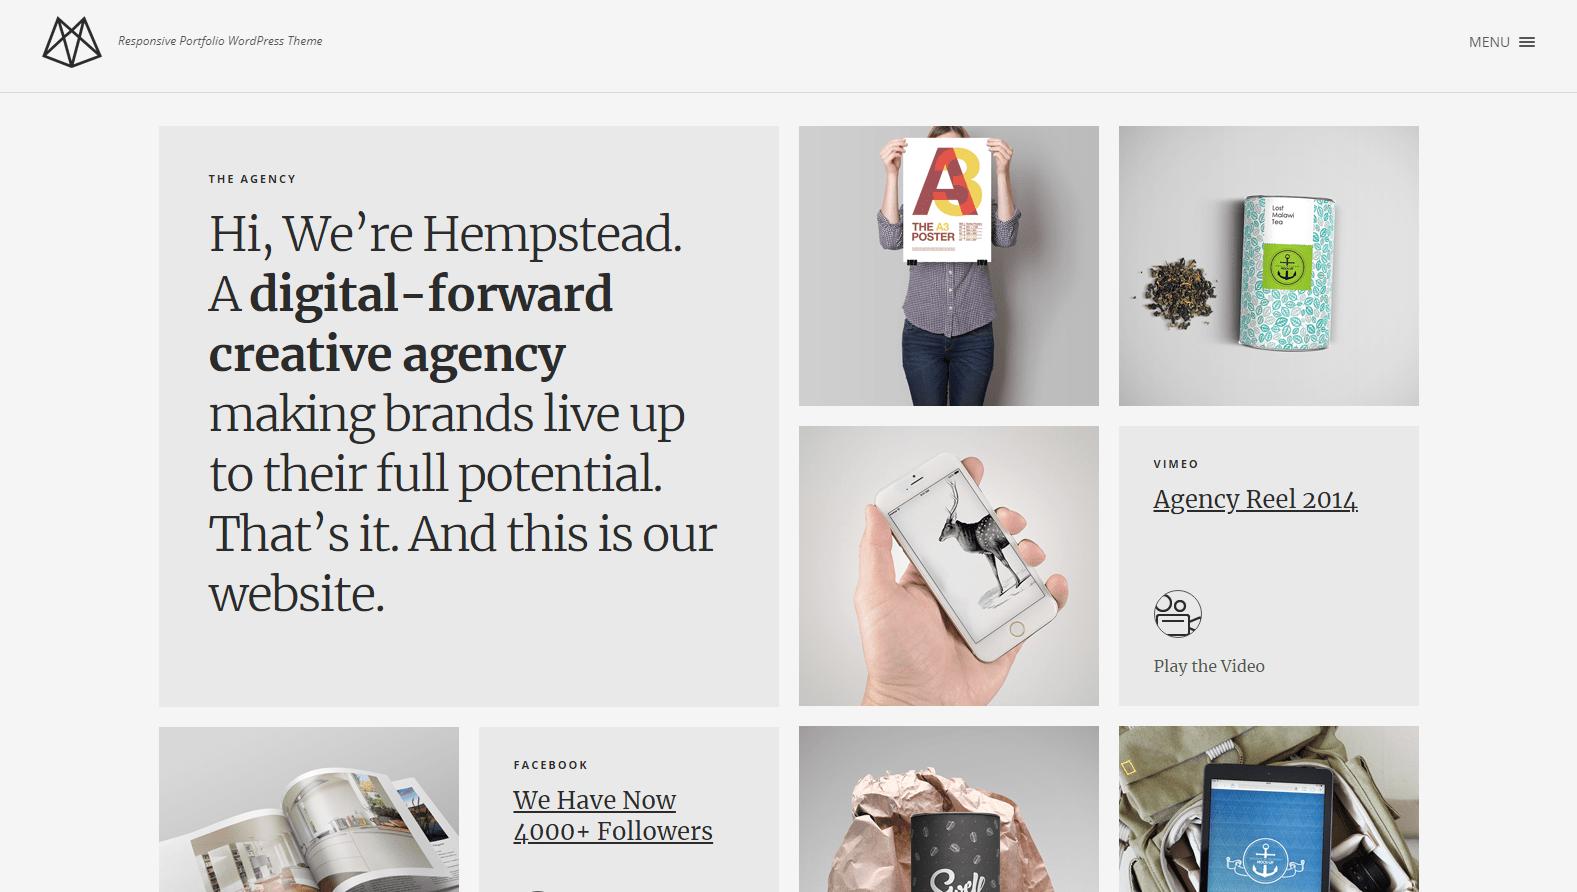 40 Creative Portfolio WordPress Themes in 2019 | StylemixThemes